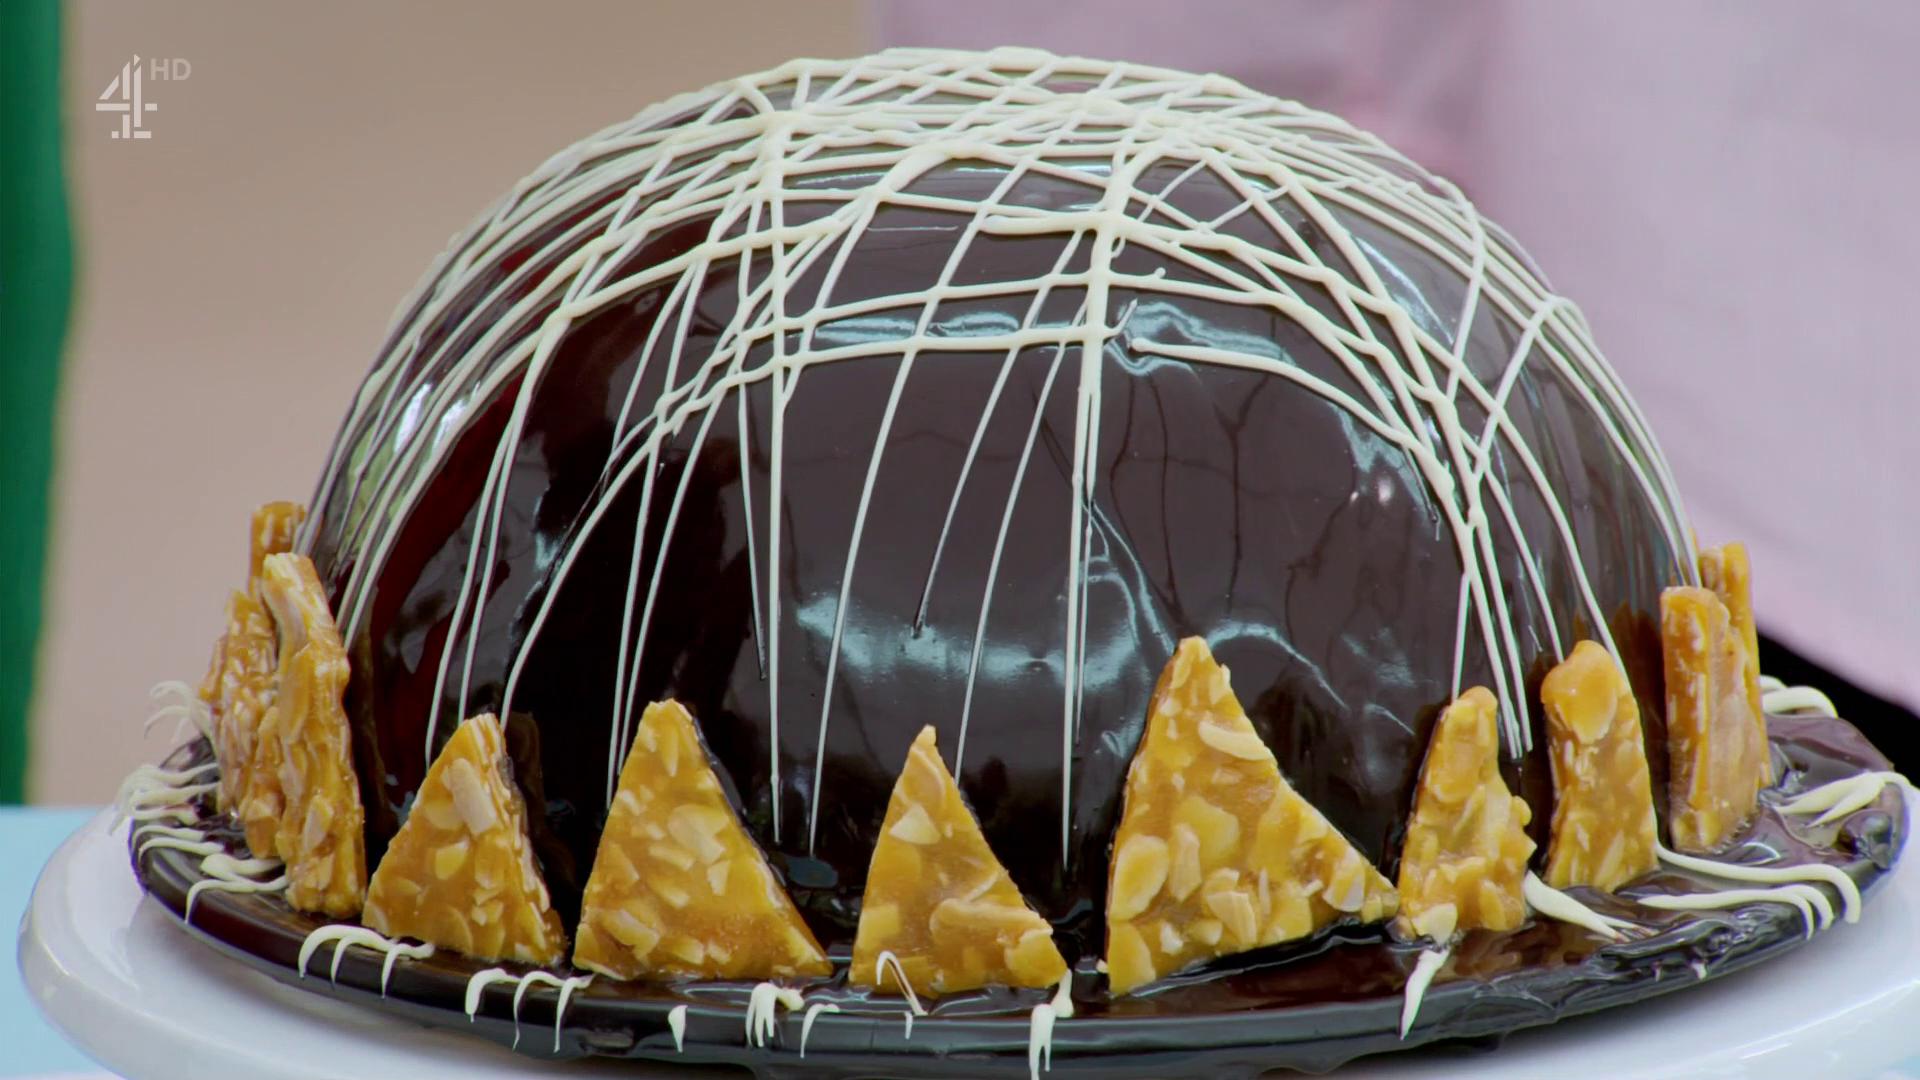 A chocolate bombe on Great British Bake Off 2019 Dessert Week